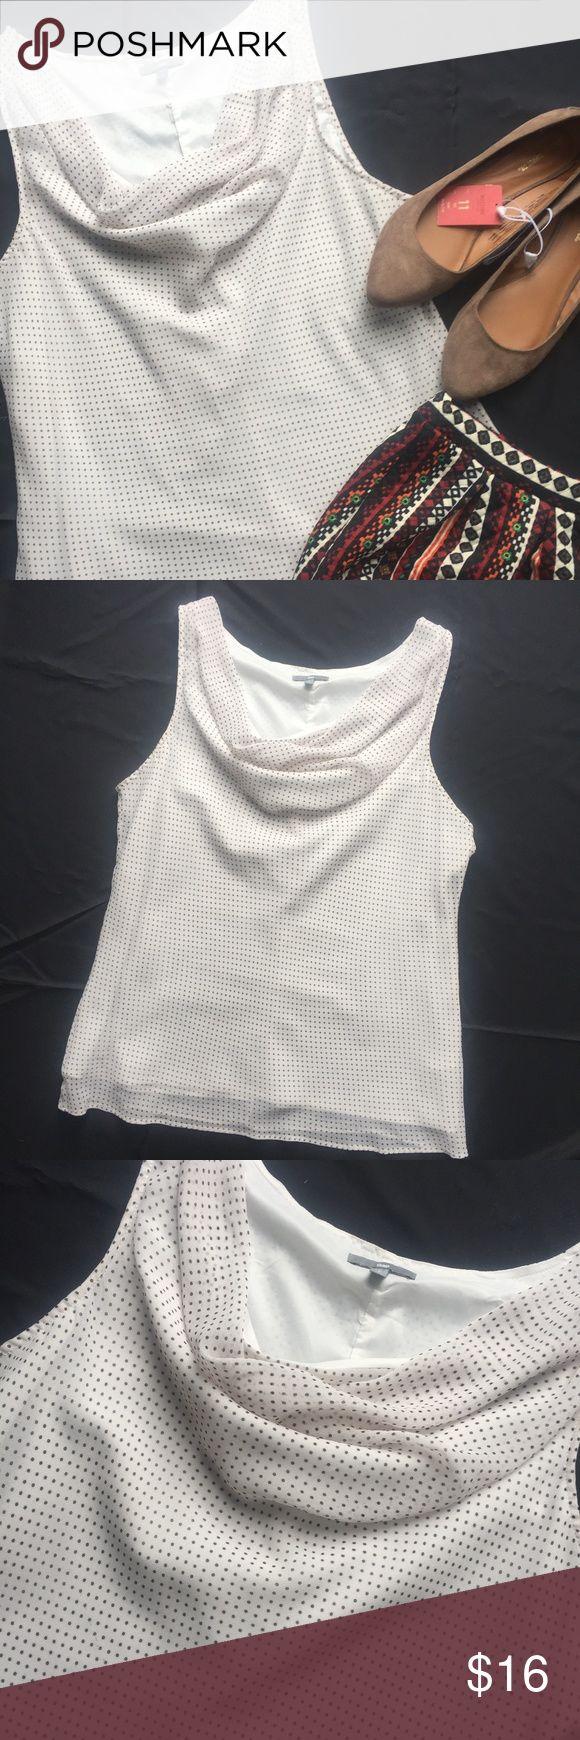 "Cream Sleeveless GAP Top w/Black Polka Dots Beautiful fully lined, draped-neck, sleeveless top by GAP.  Cream with black polka dots, EUC.  Pit-to-pit = 21"" and shoulder-to-hem = 28"" GAP Tops"